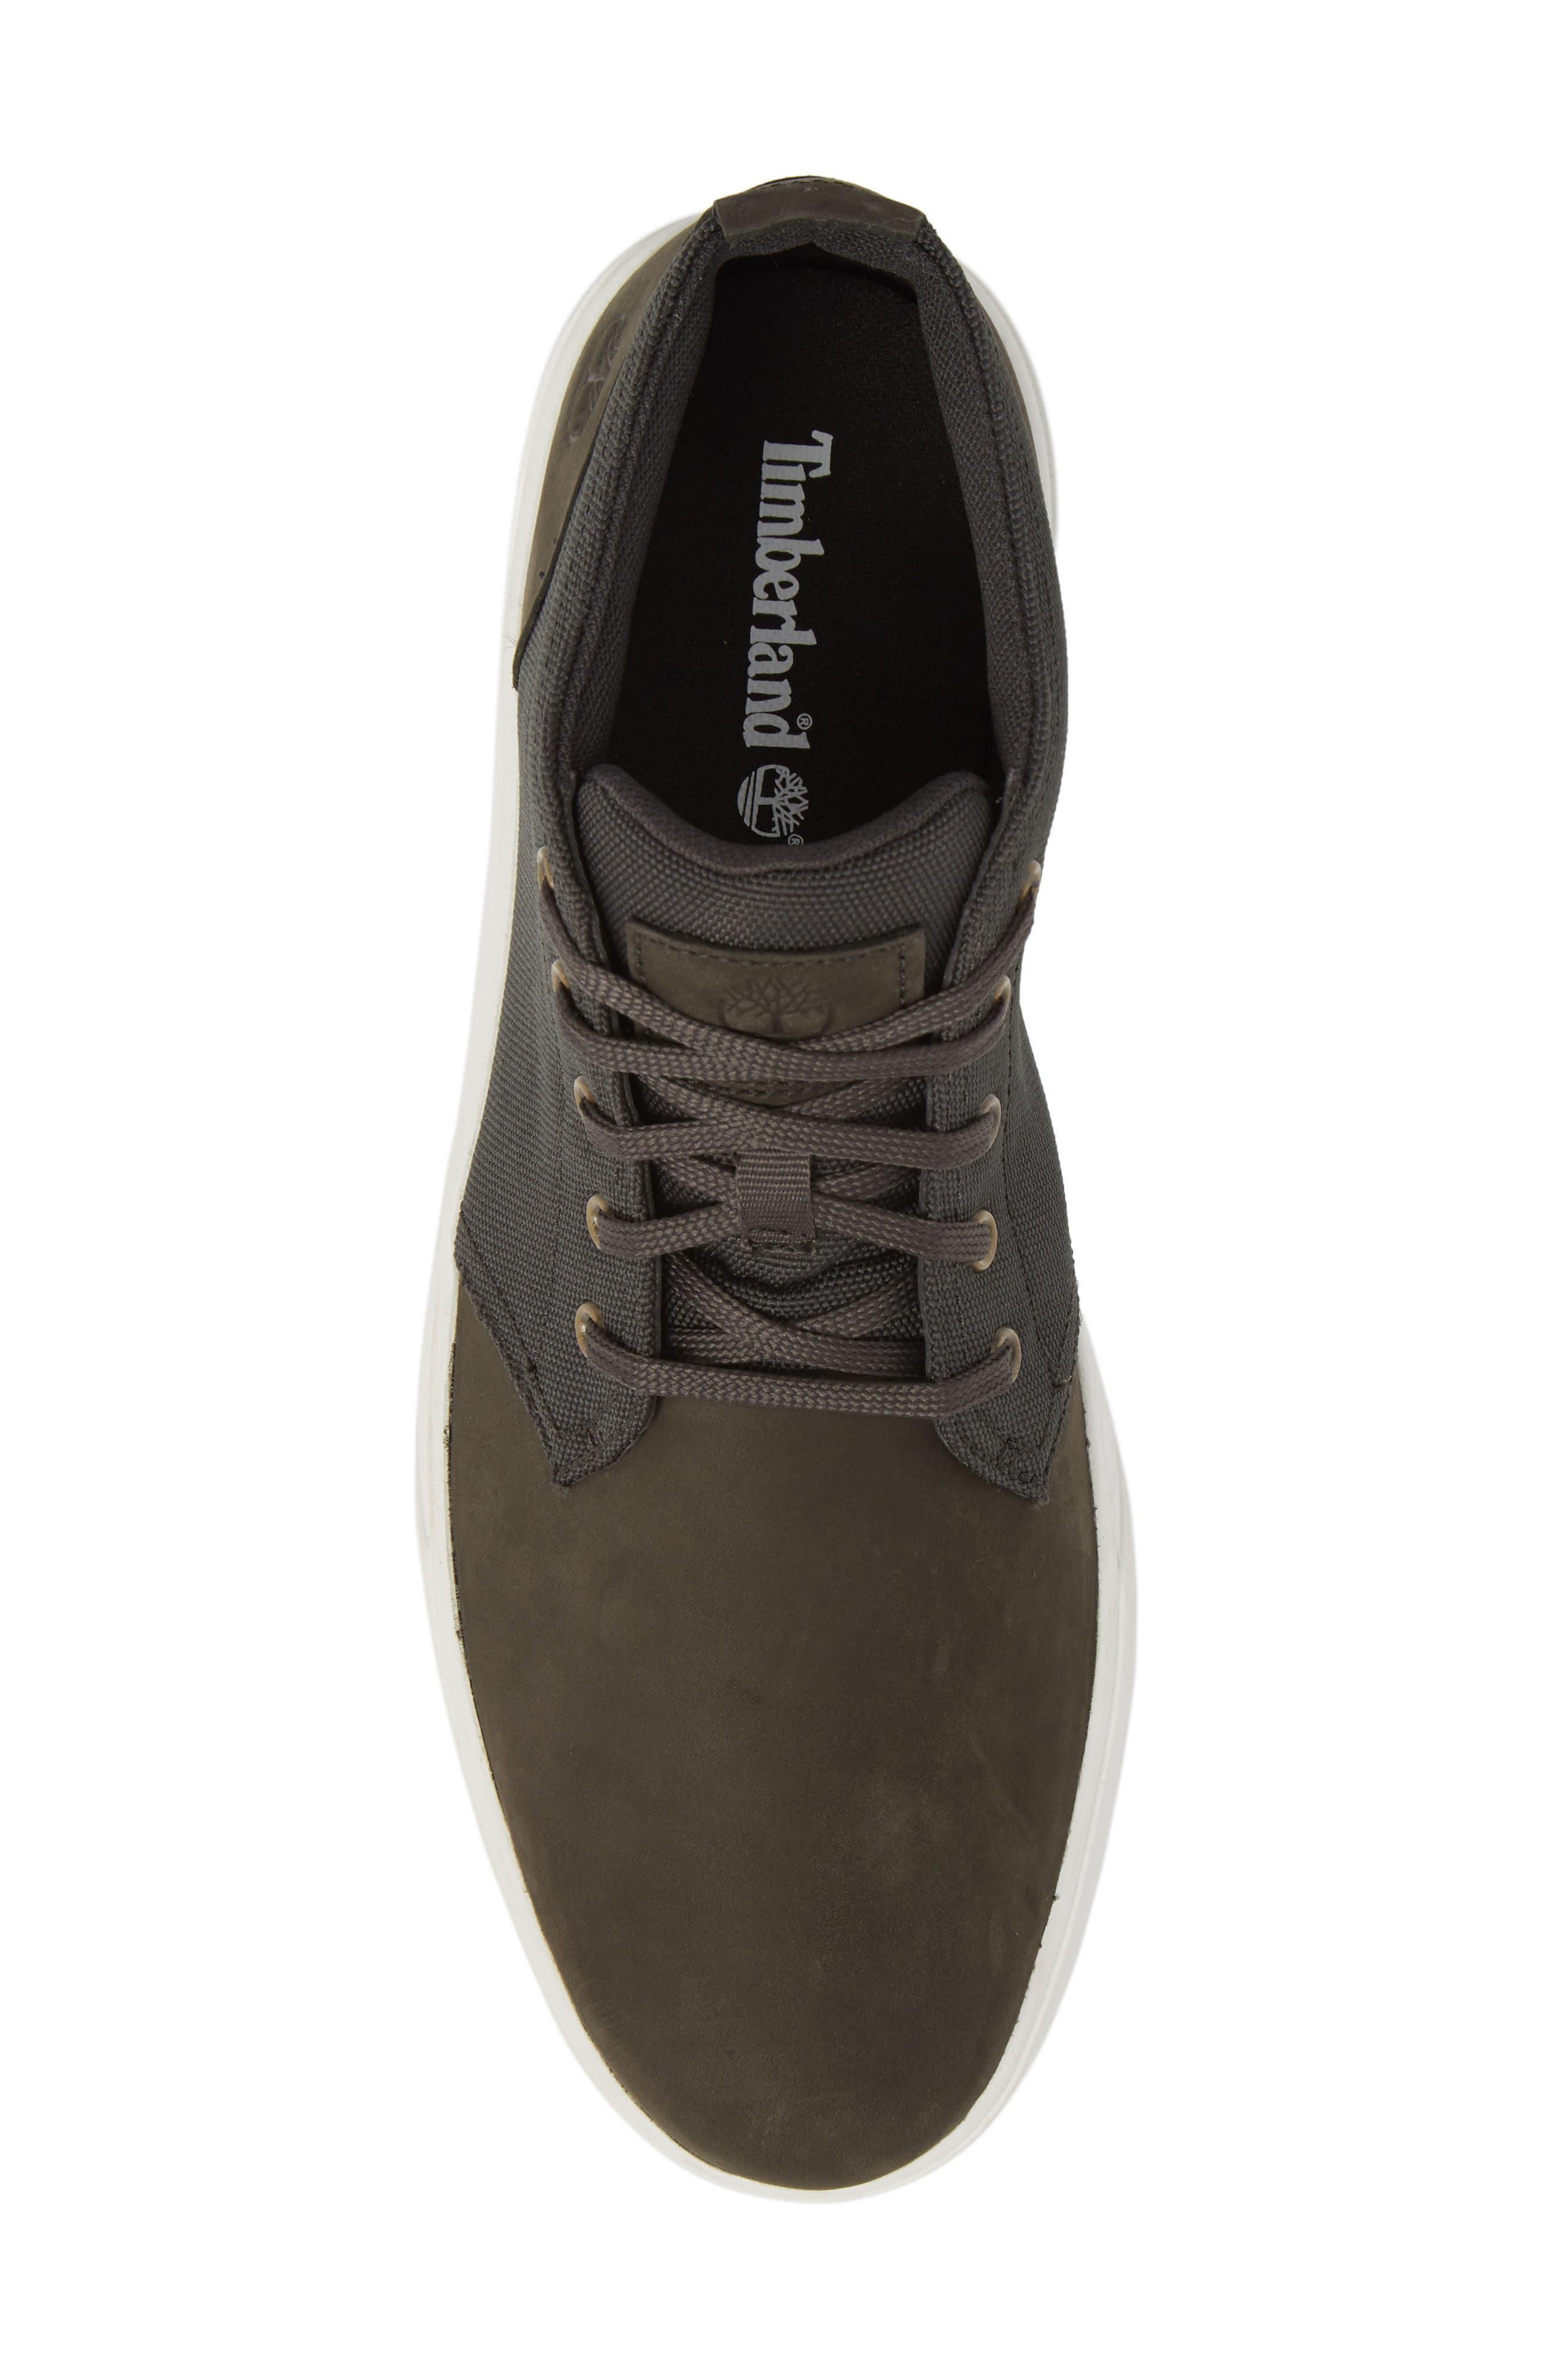 Earthkeepers<sup>™</sup> 'Groveton' Chukka Sneaker,                             Alternate thumbnail 5, color,                             DARK GREEN NUBUCK